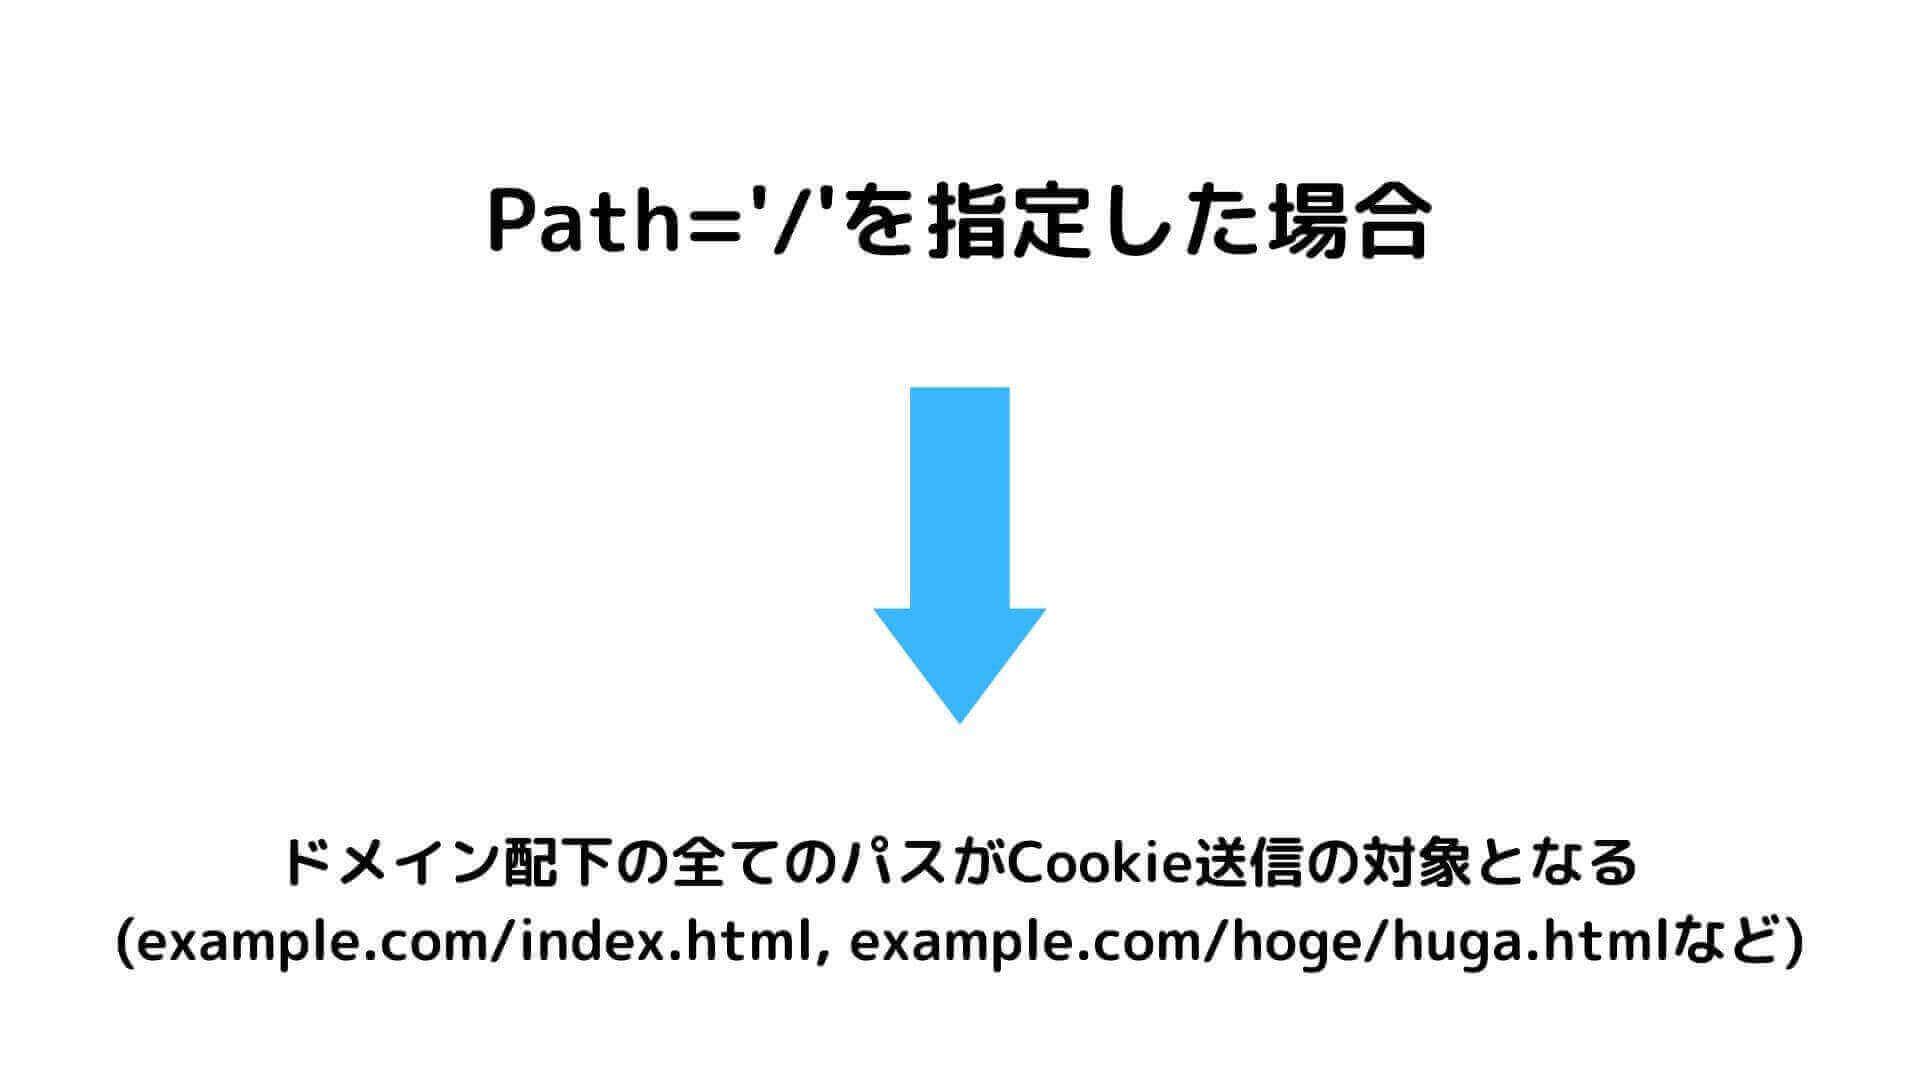 CookieのPath属性について